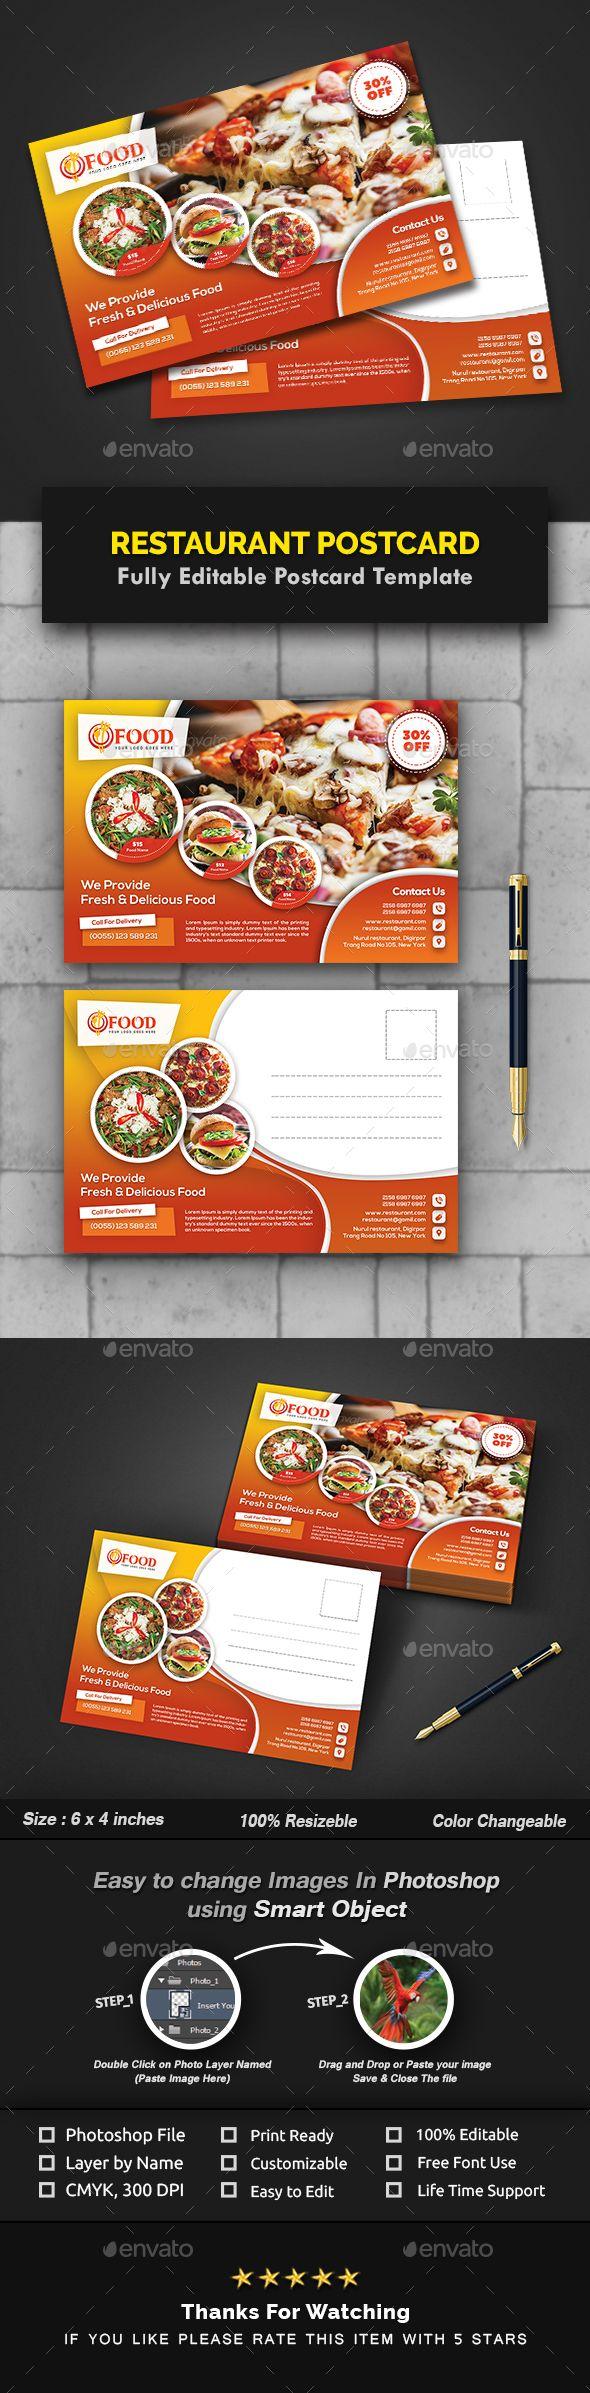 Restaurant Postcard Templates Postcard Template Templates Business Powerpoint Templates